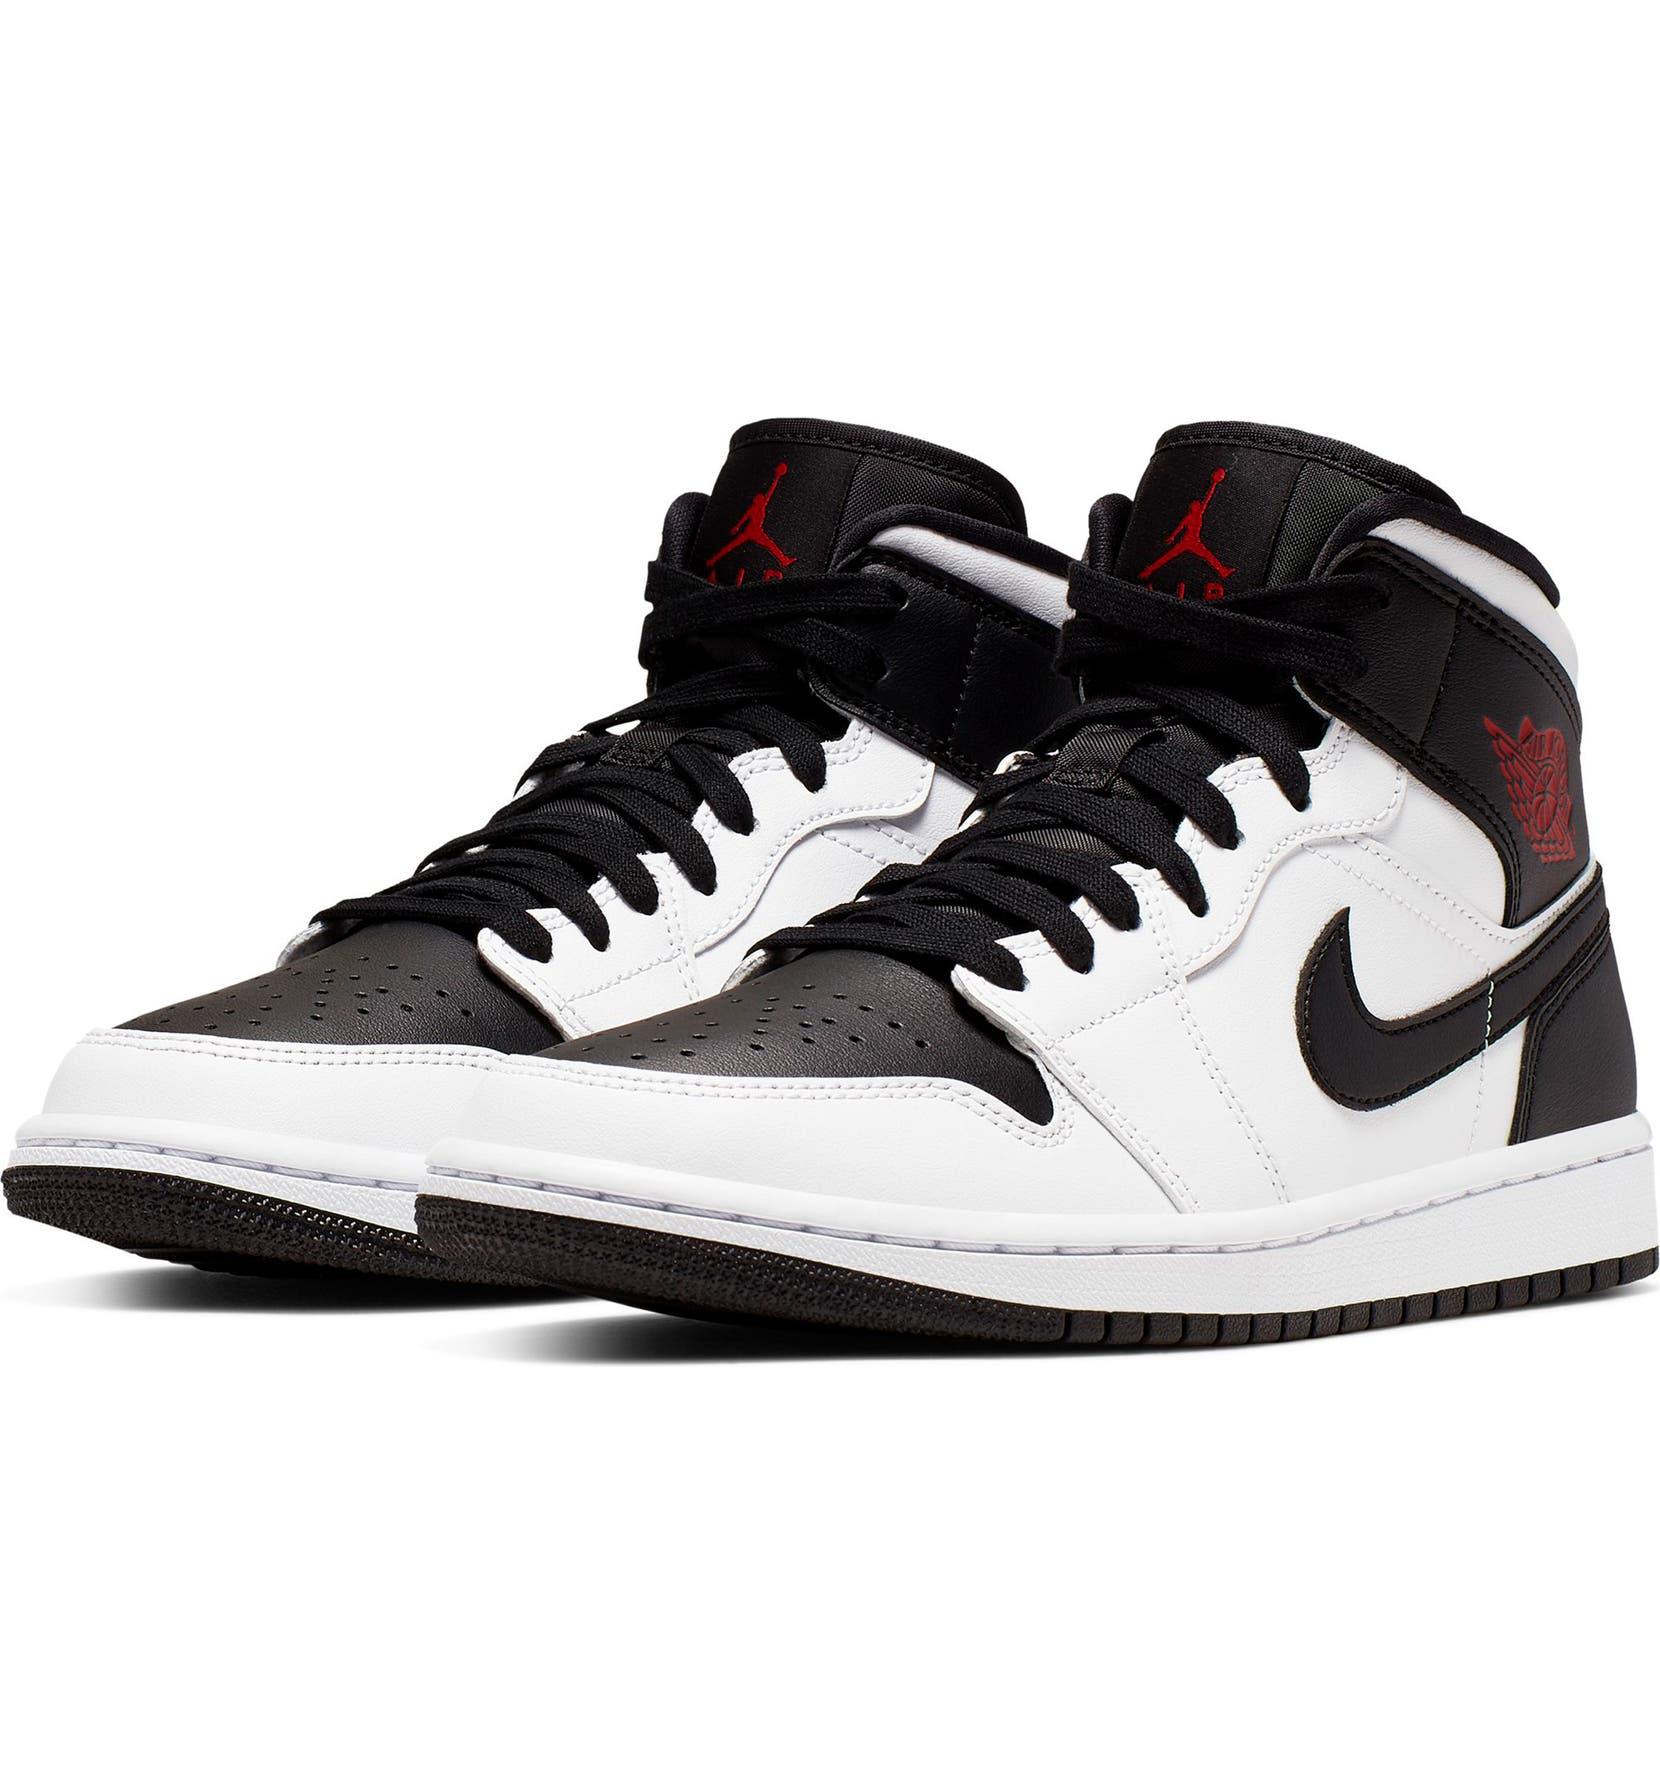 separation shoes 895df 5c4a7 Nike Air Jordan 1 Mid Sneaker